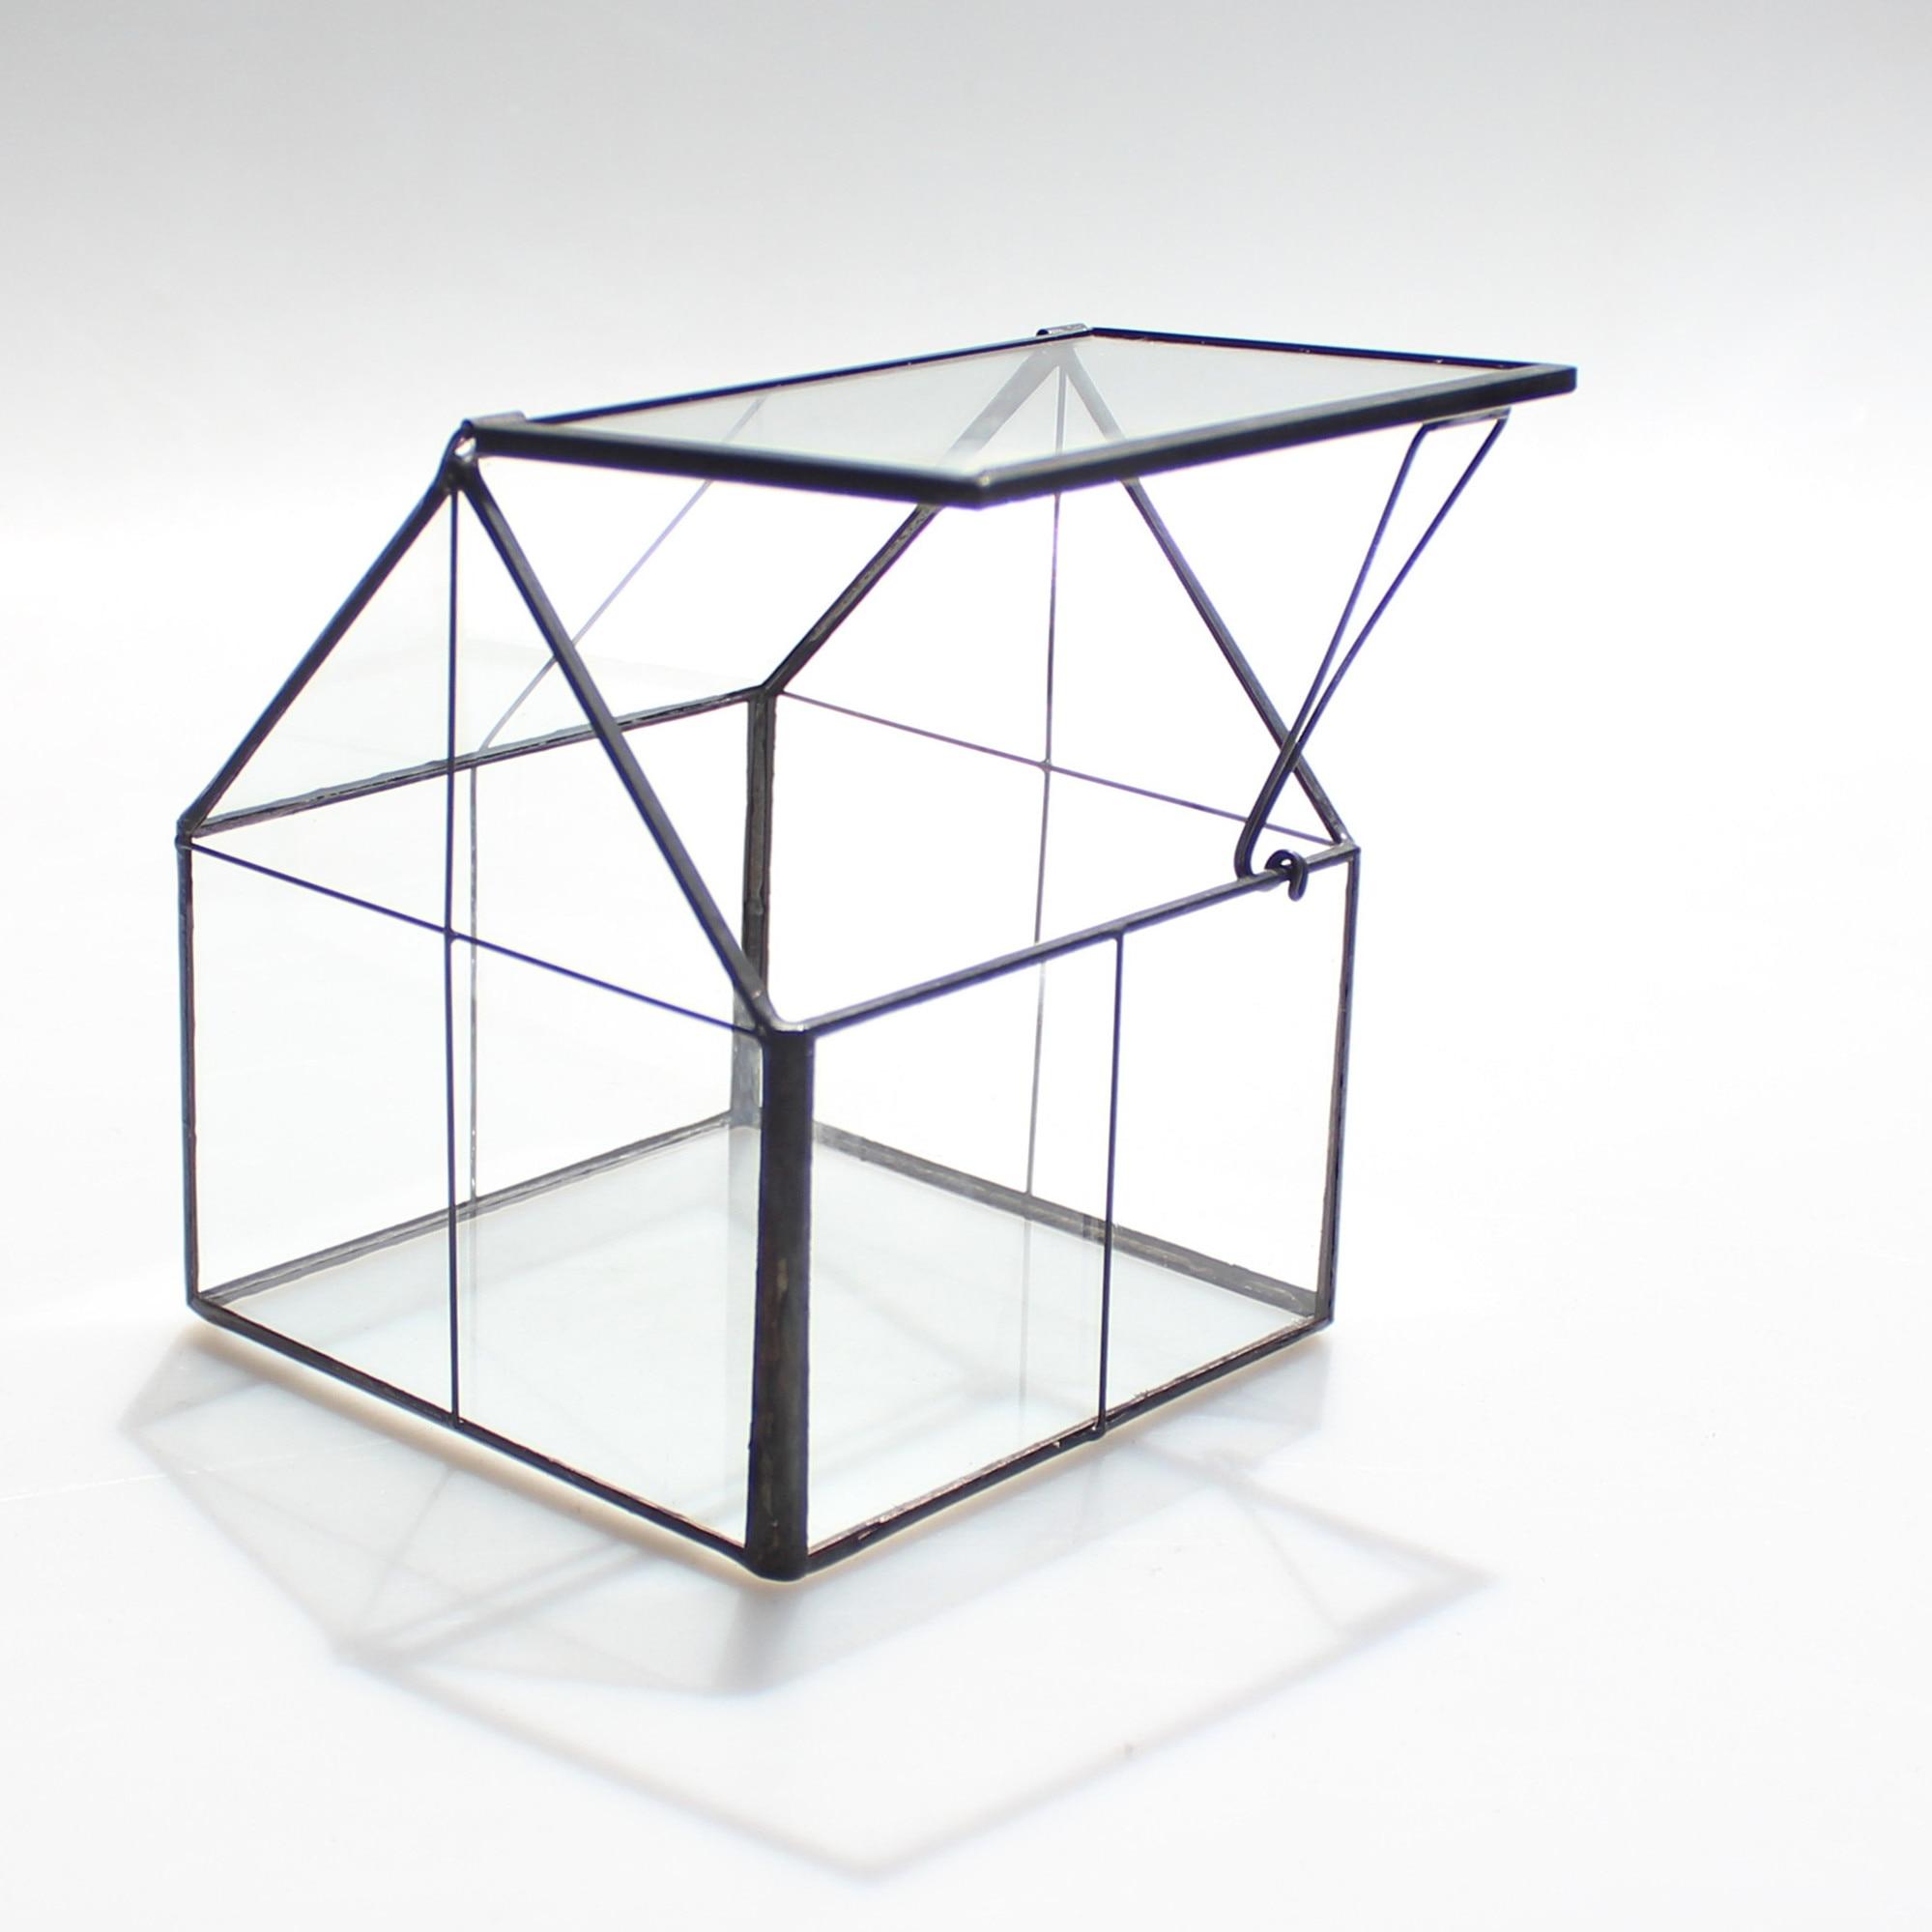 Ncyp Modern Glass Terrarium Black Copper Tabletop Geometric Terrarium Grid Pattern Floor Vase Home Decoration Accessories Vases Aliexpress